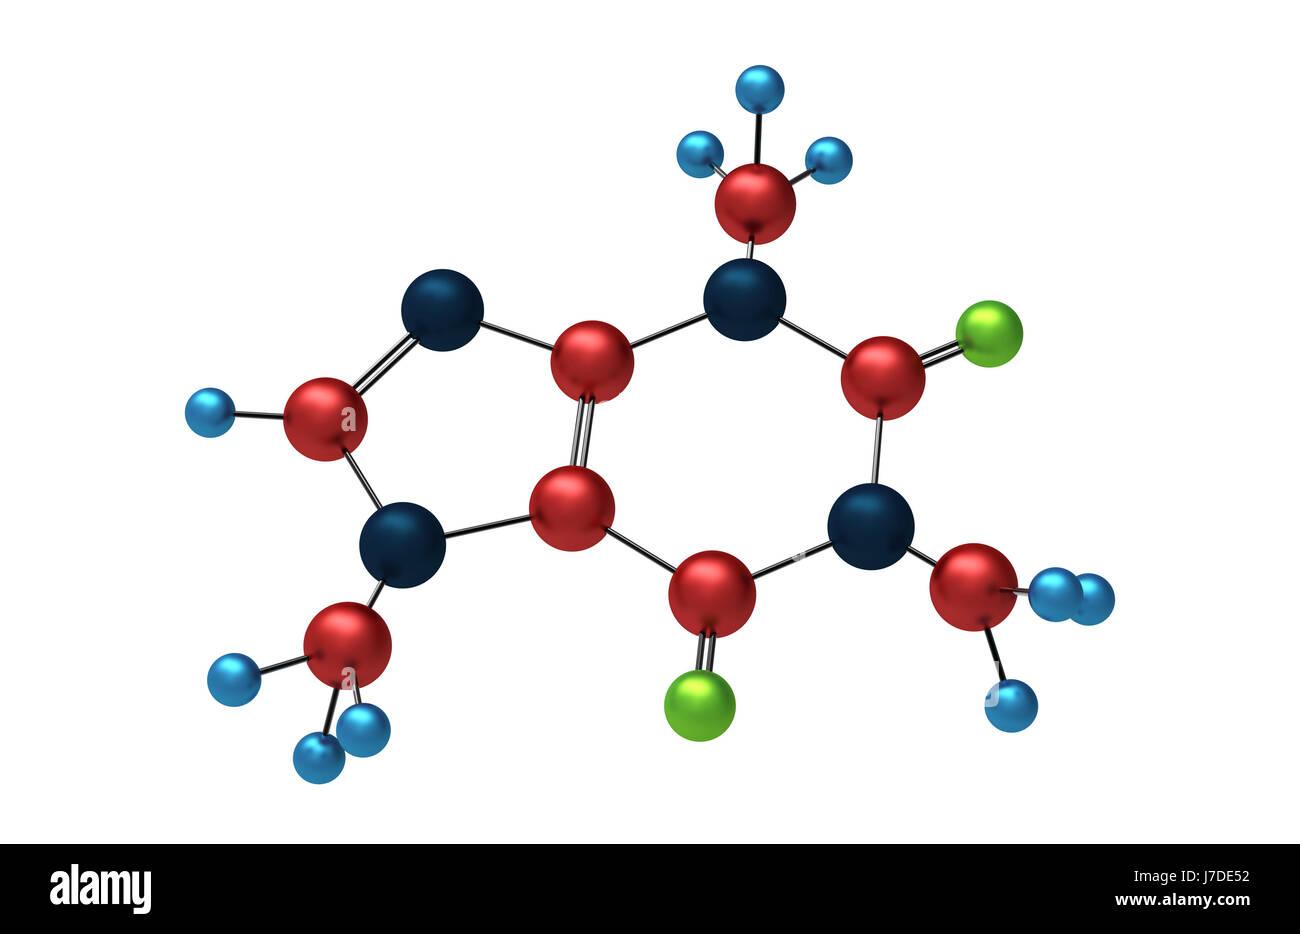 Kaffee Atom Koffein chemische Modell molekularen Molekül Rendern 3d ...